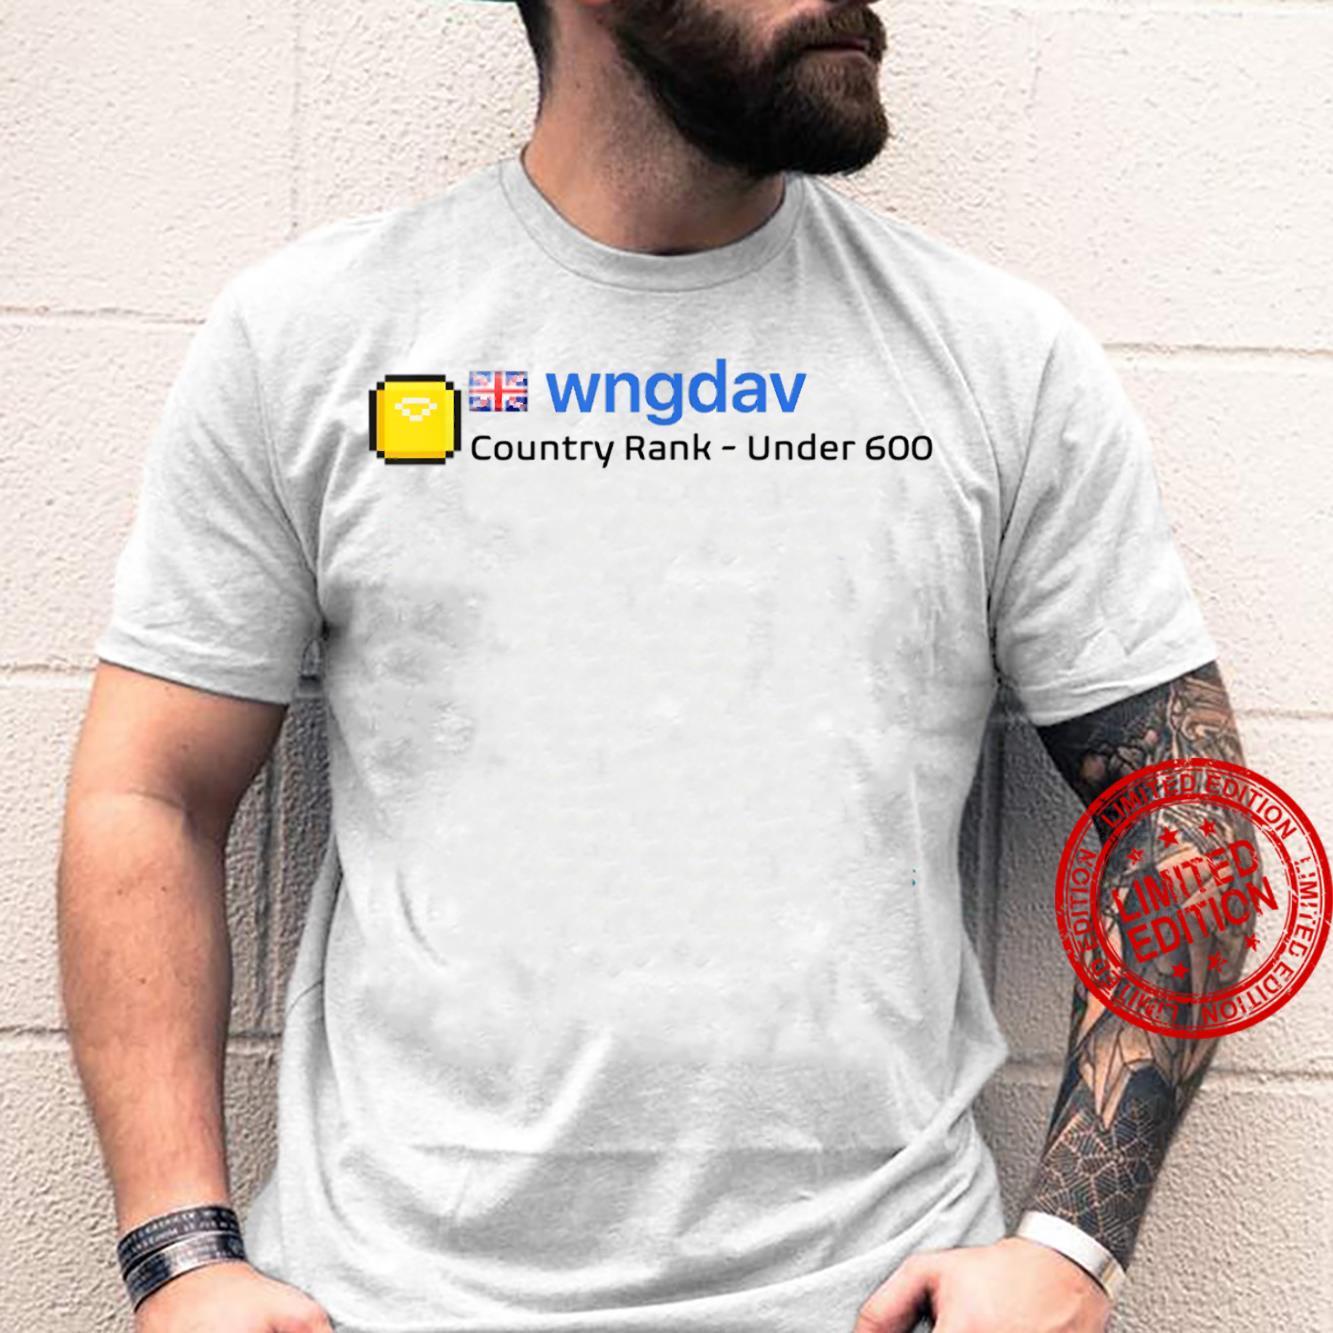 Wngdav Scoresaber Shirt